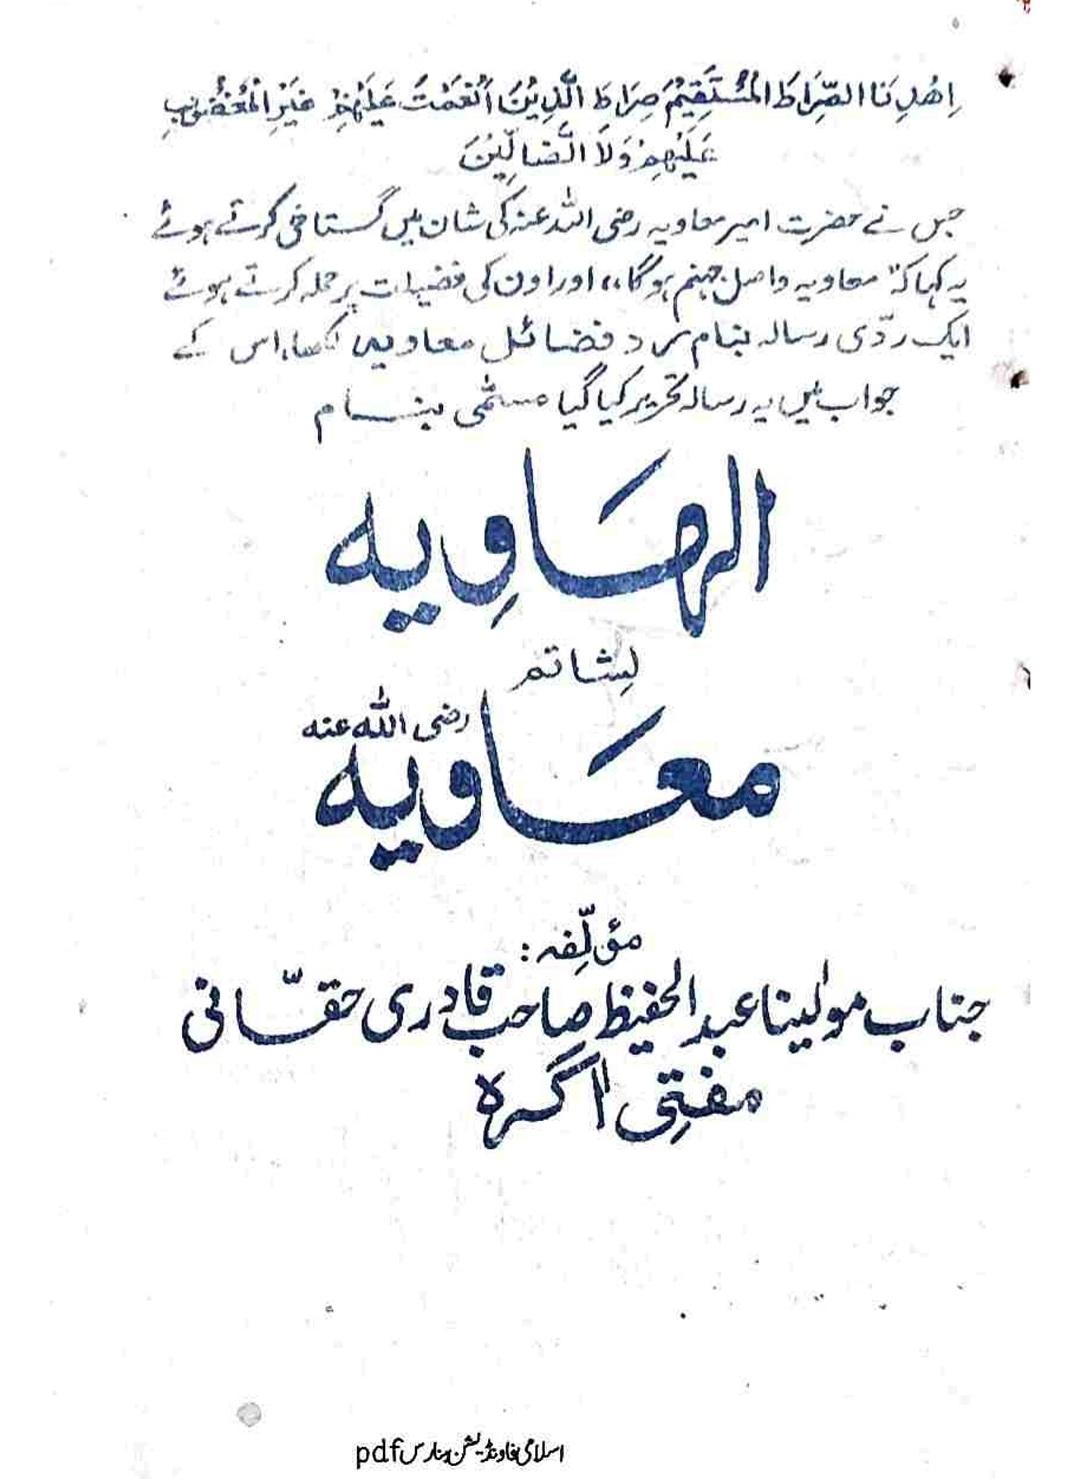 Al Hawiya Lishatim Muawiyah / الھاویہ لشاتم معاویہby مولانا عبد الحفیظ حقانی قادری